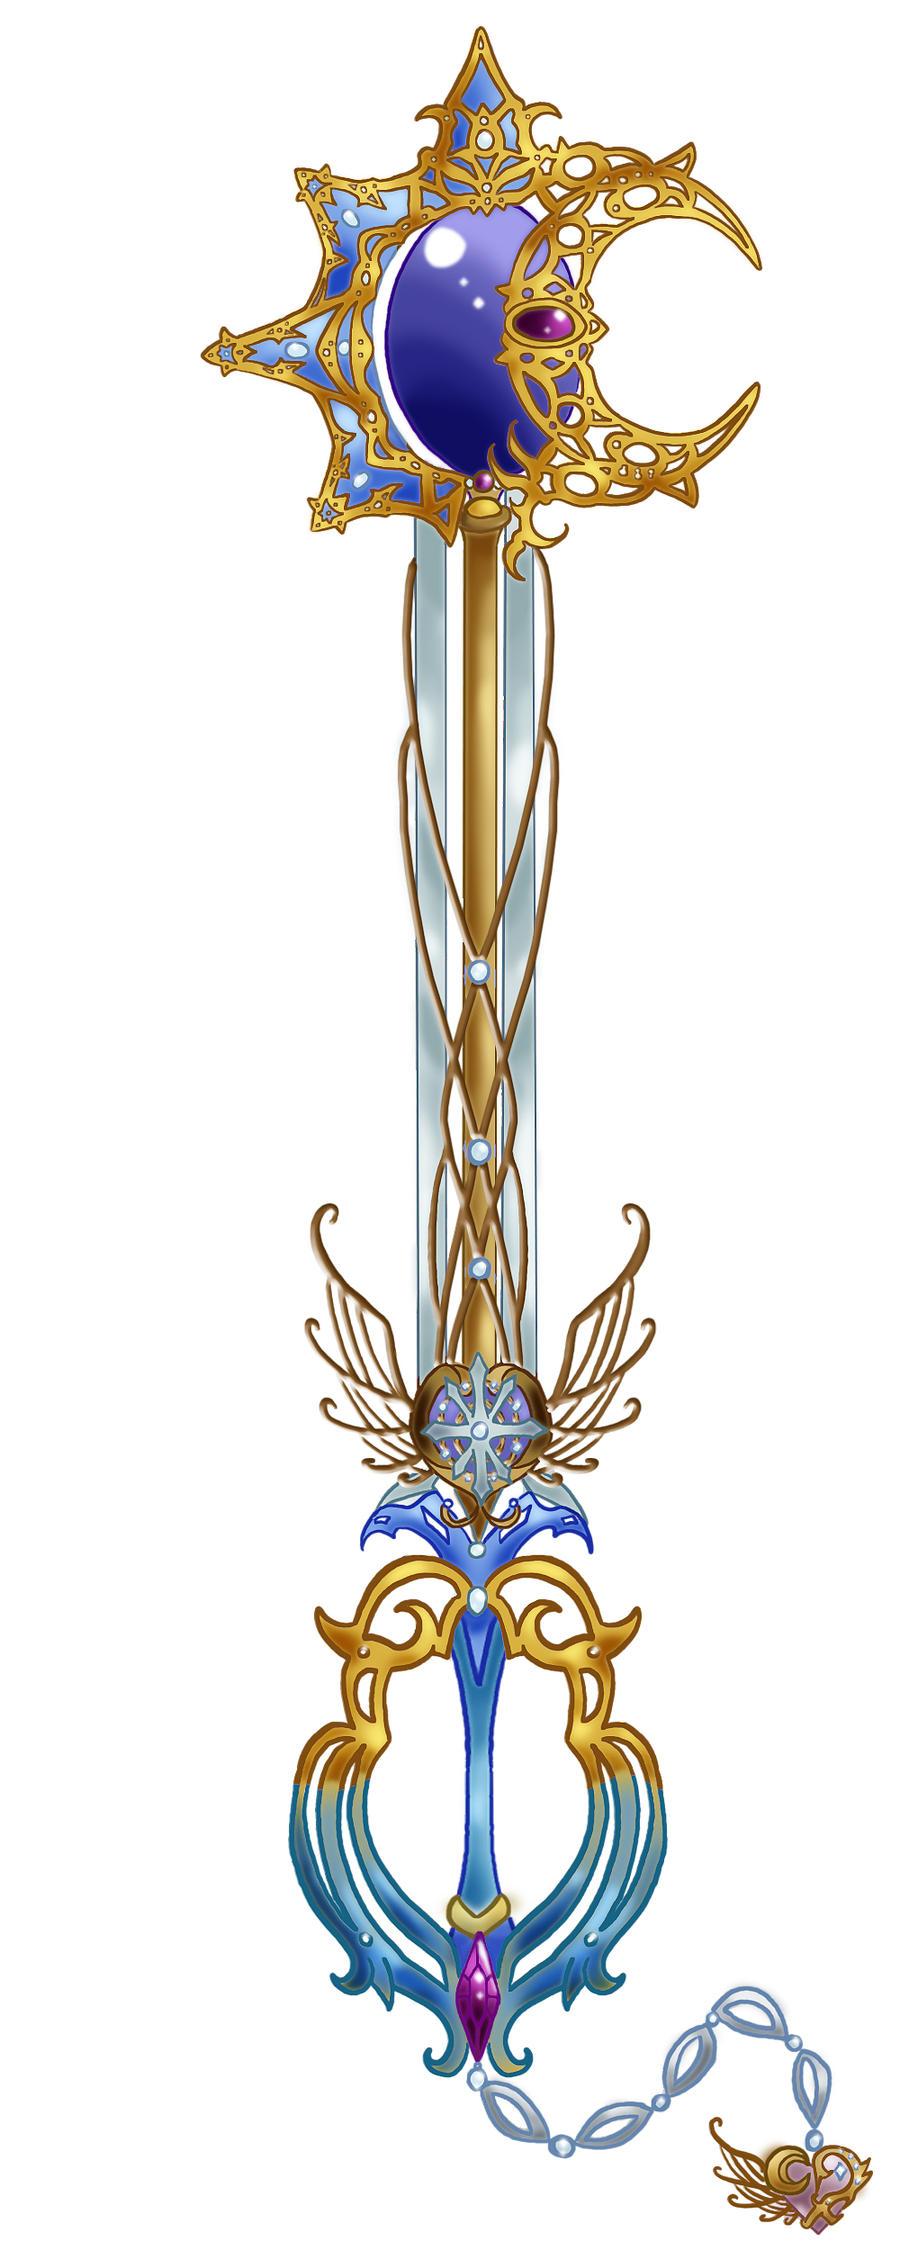 The Lunaticus Estella keyblade by Lrme87 on DeviantArt